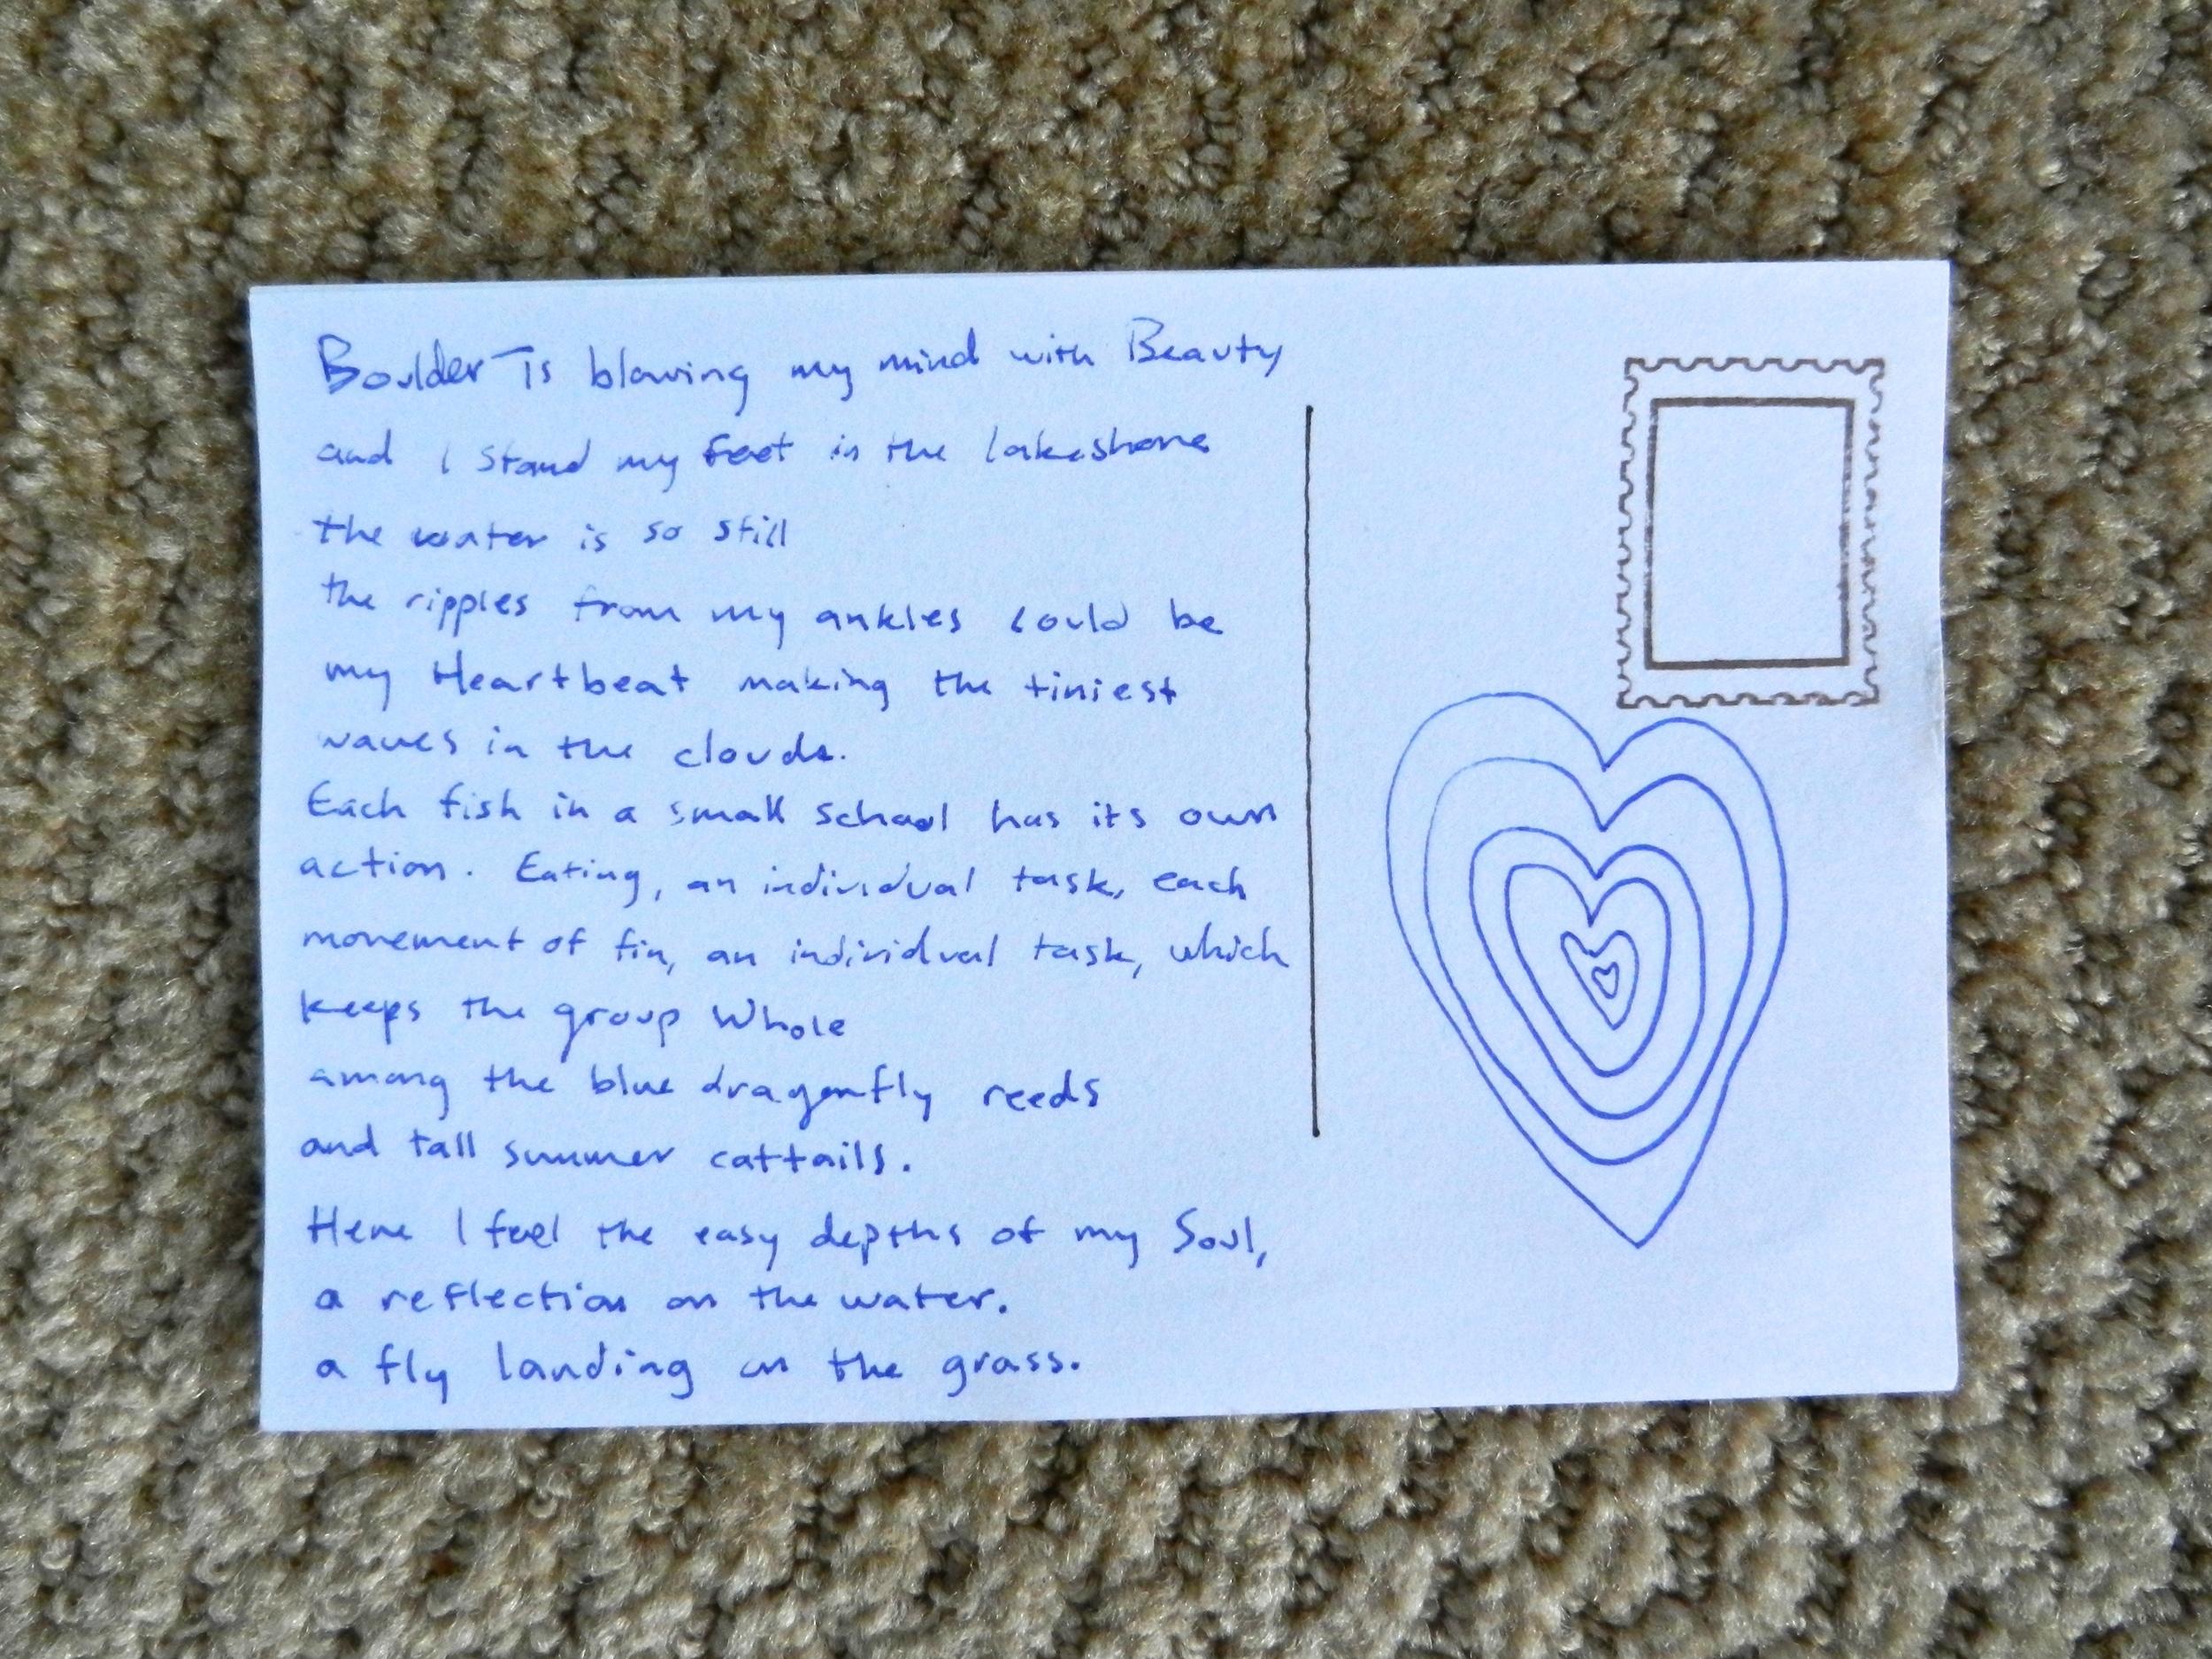 Postcard Photo Placecraft 4.JPG